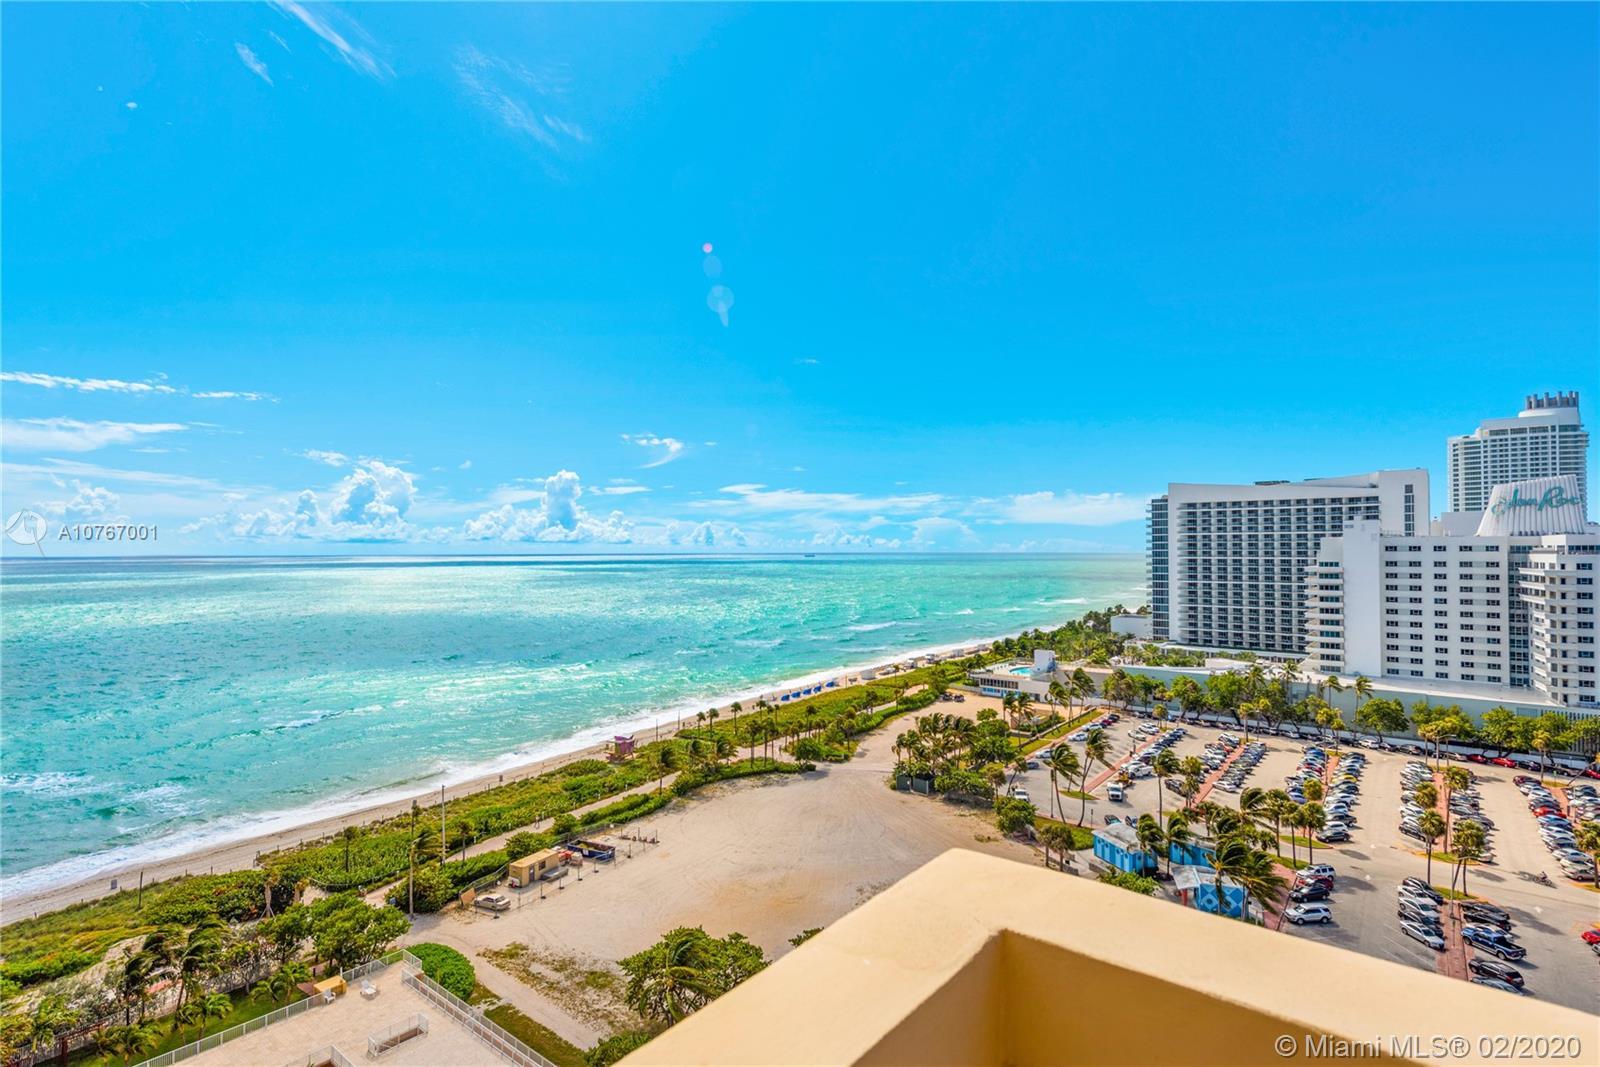 4747 Collins Ave, 1513 - Miami Beach, Florida